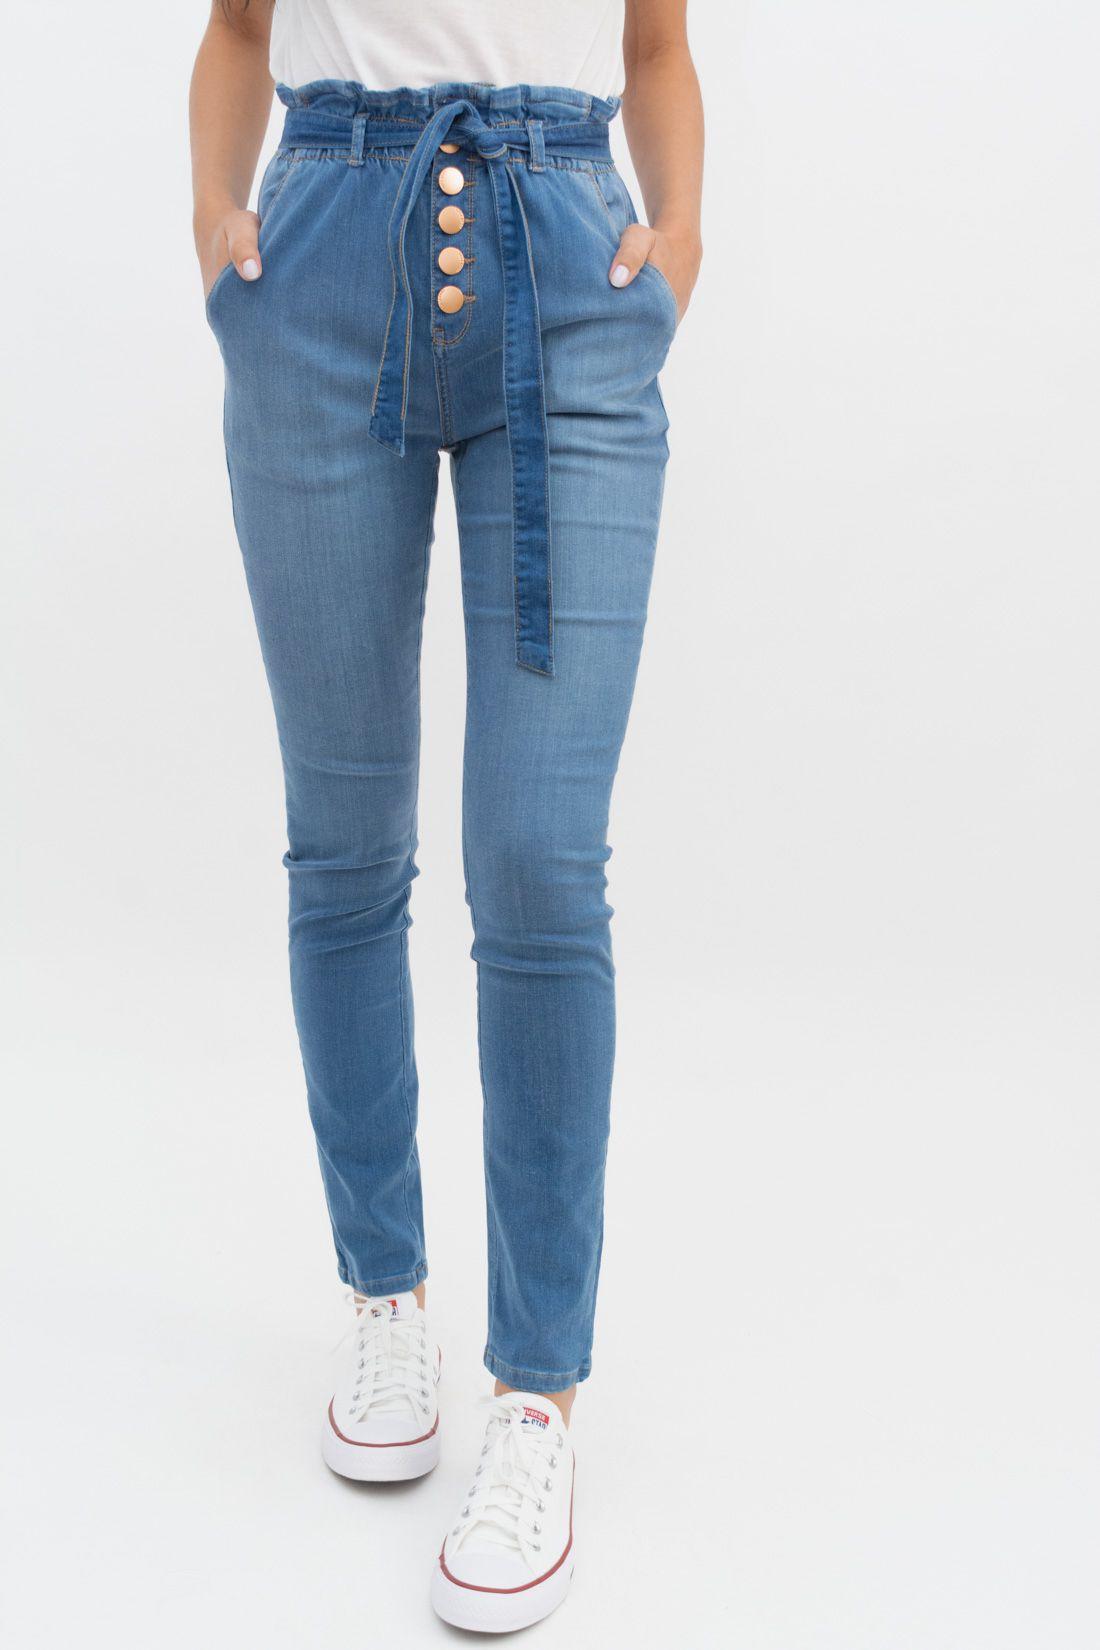 Calca Jeans Loofting Sabrina